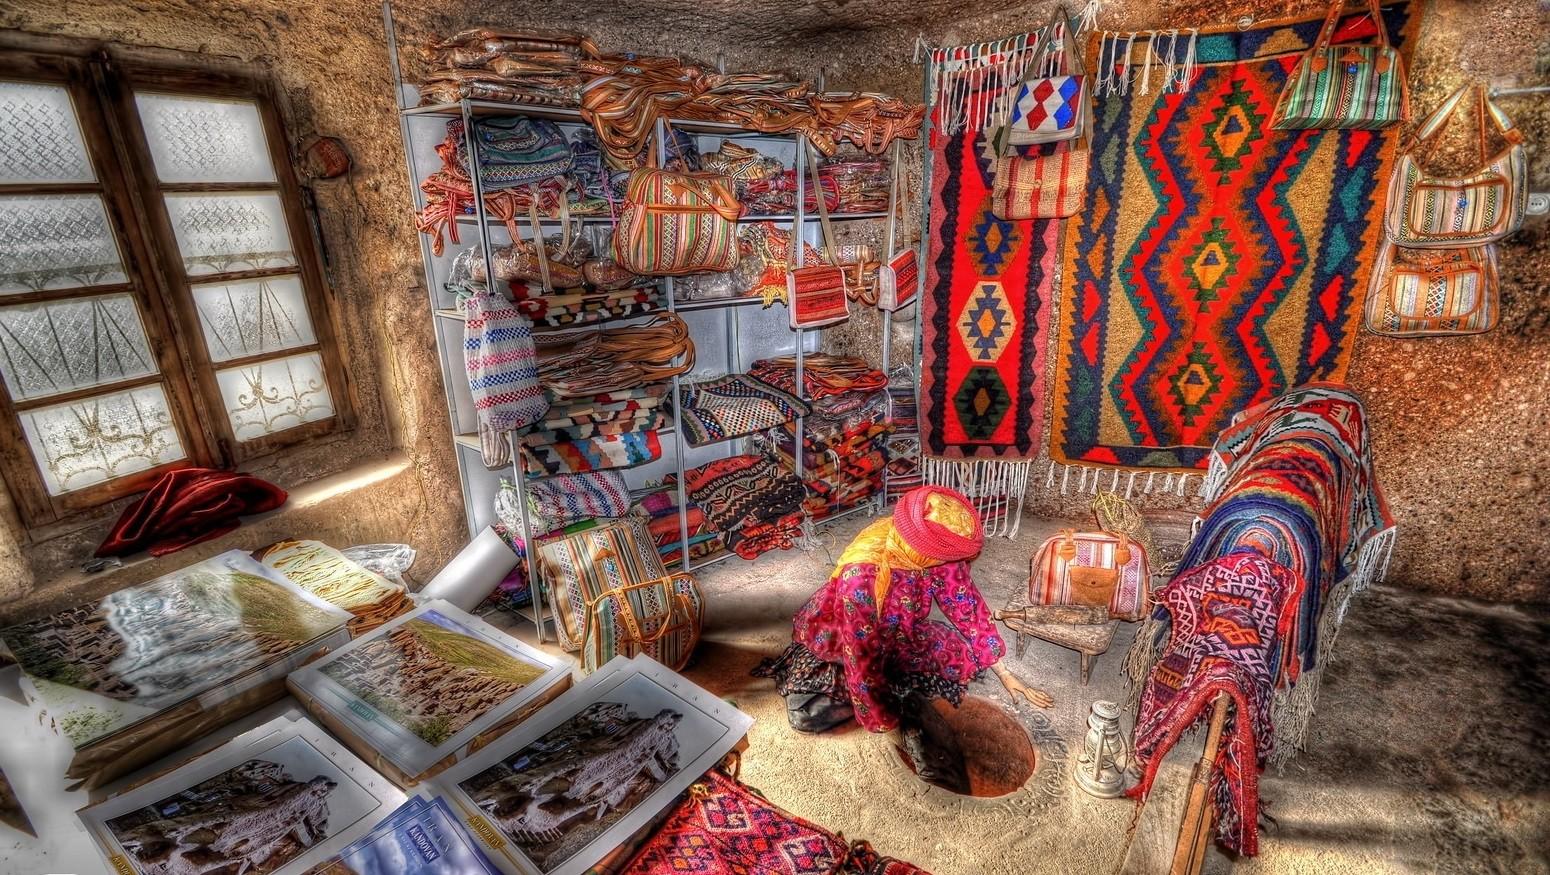 Kandovan-Village-Tabrzi-Iran-Traveling-center